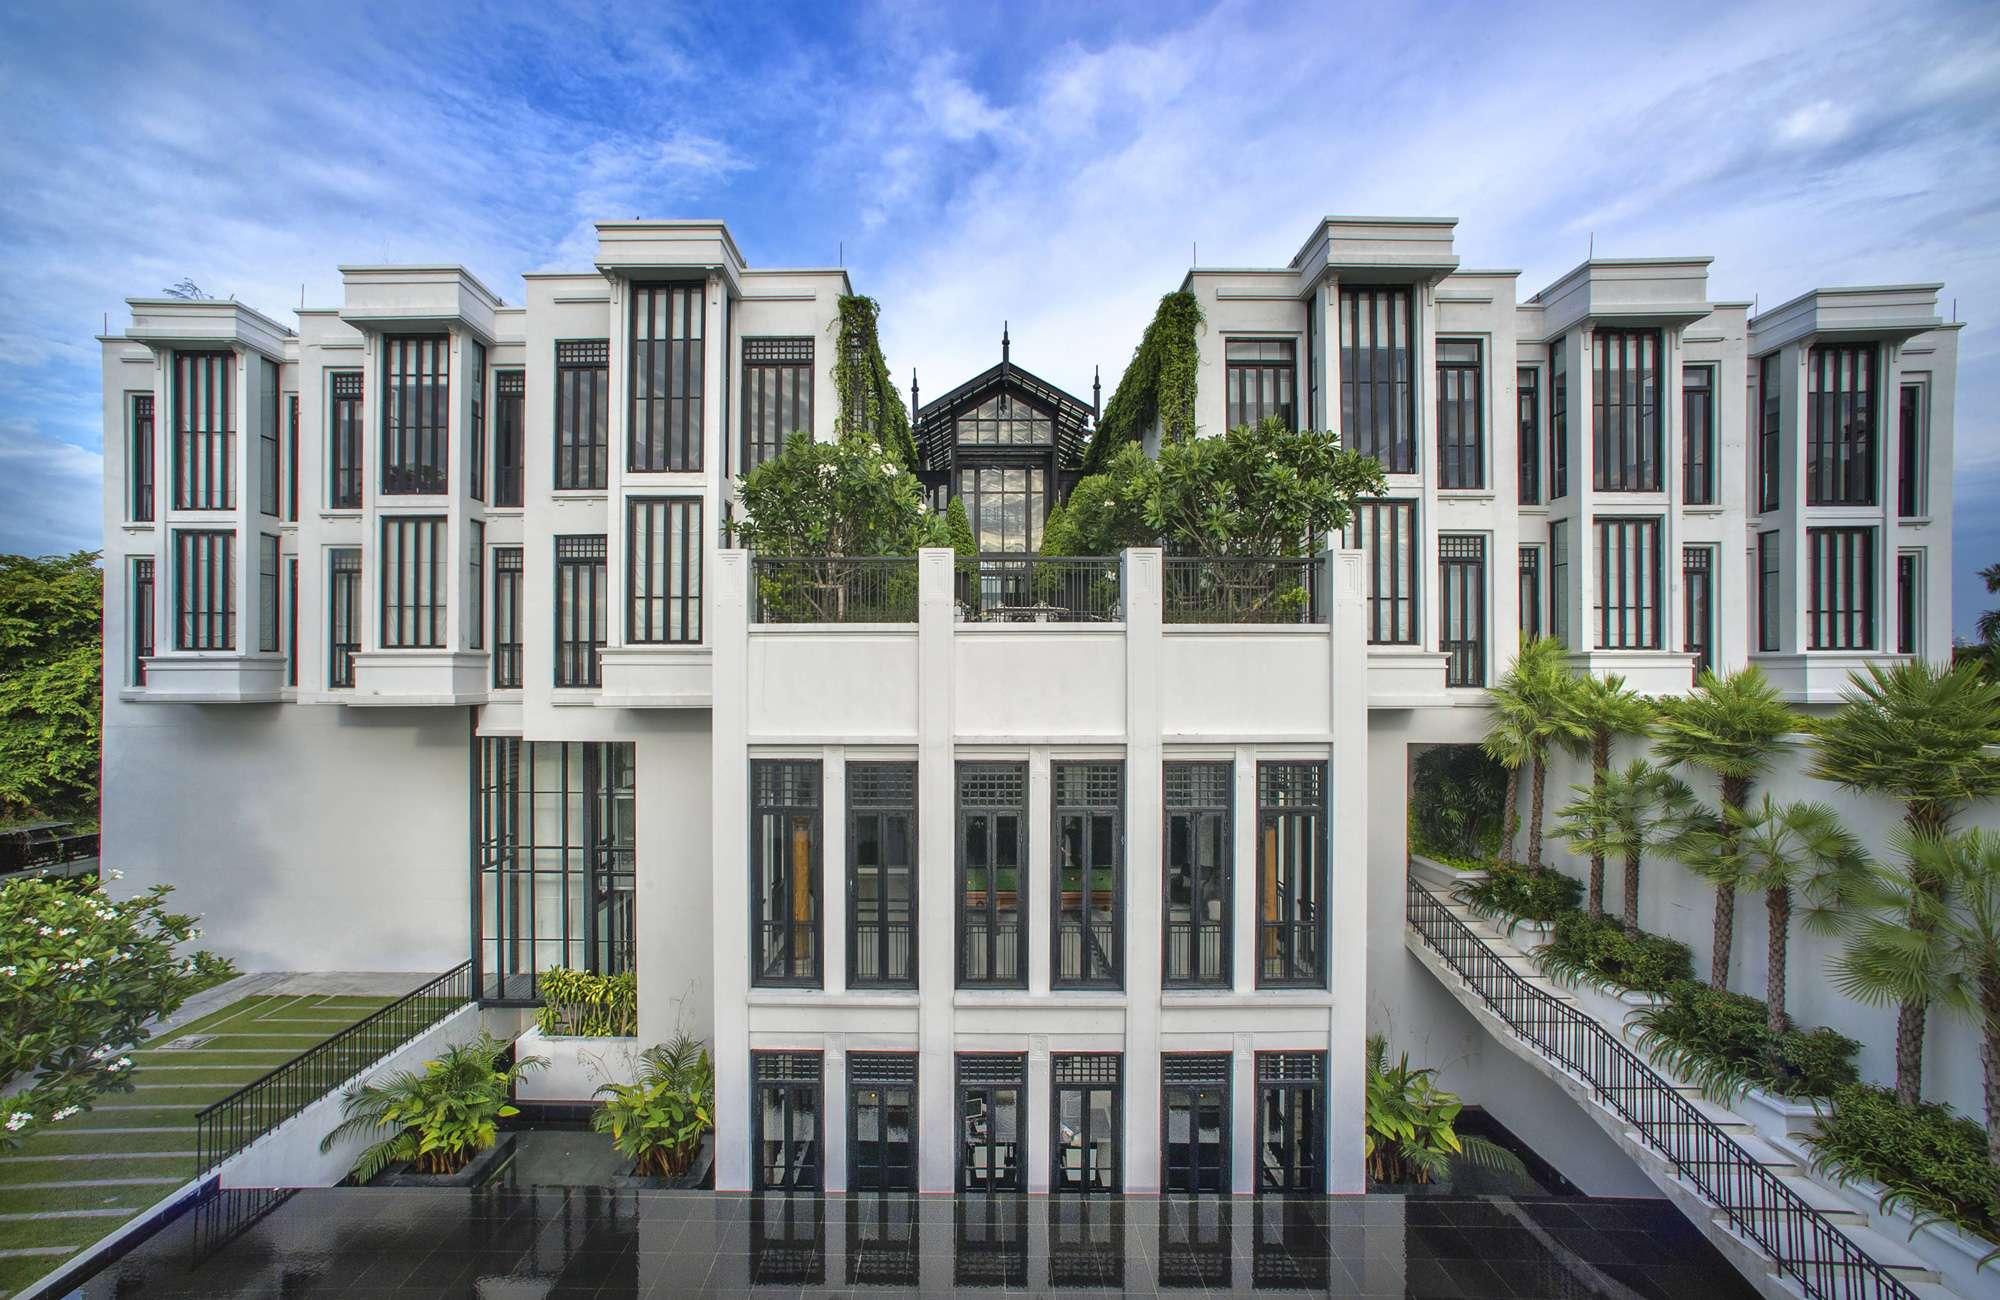 The Striking Architecture Of Siam Bangkok